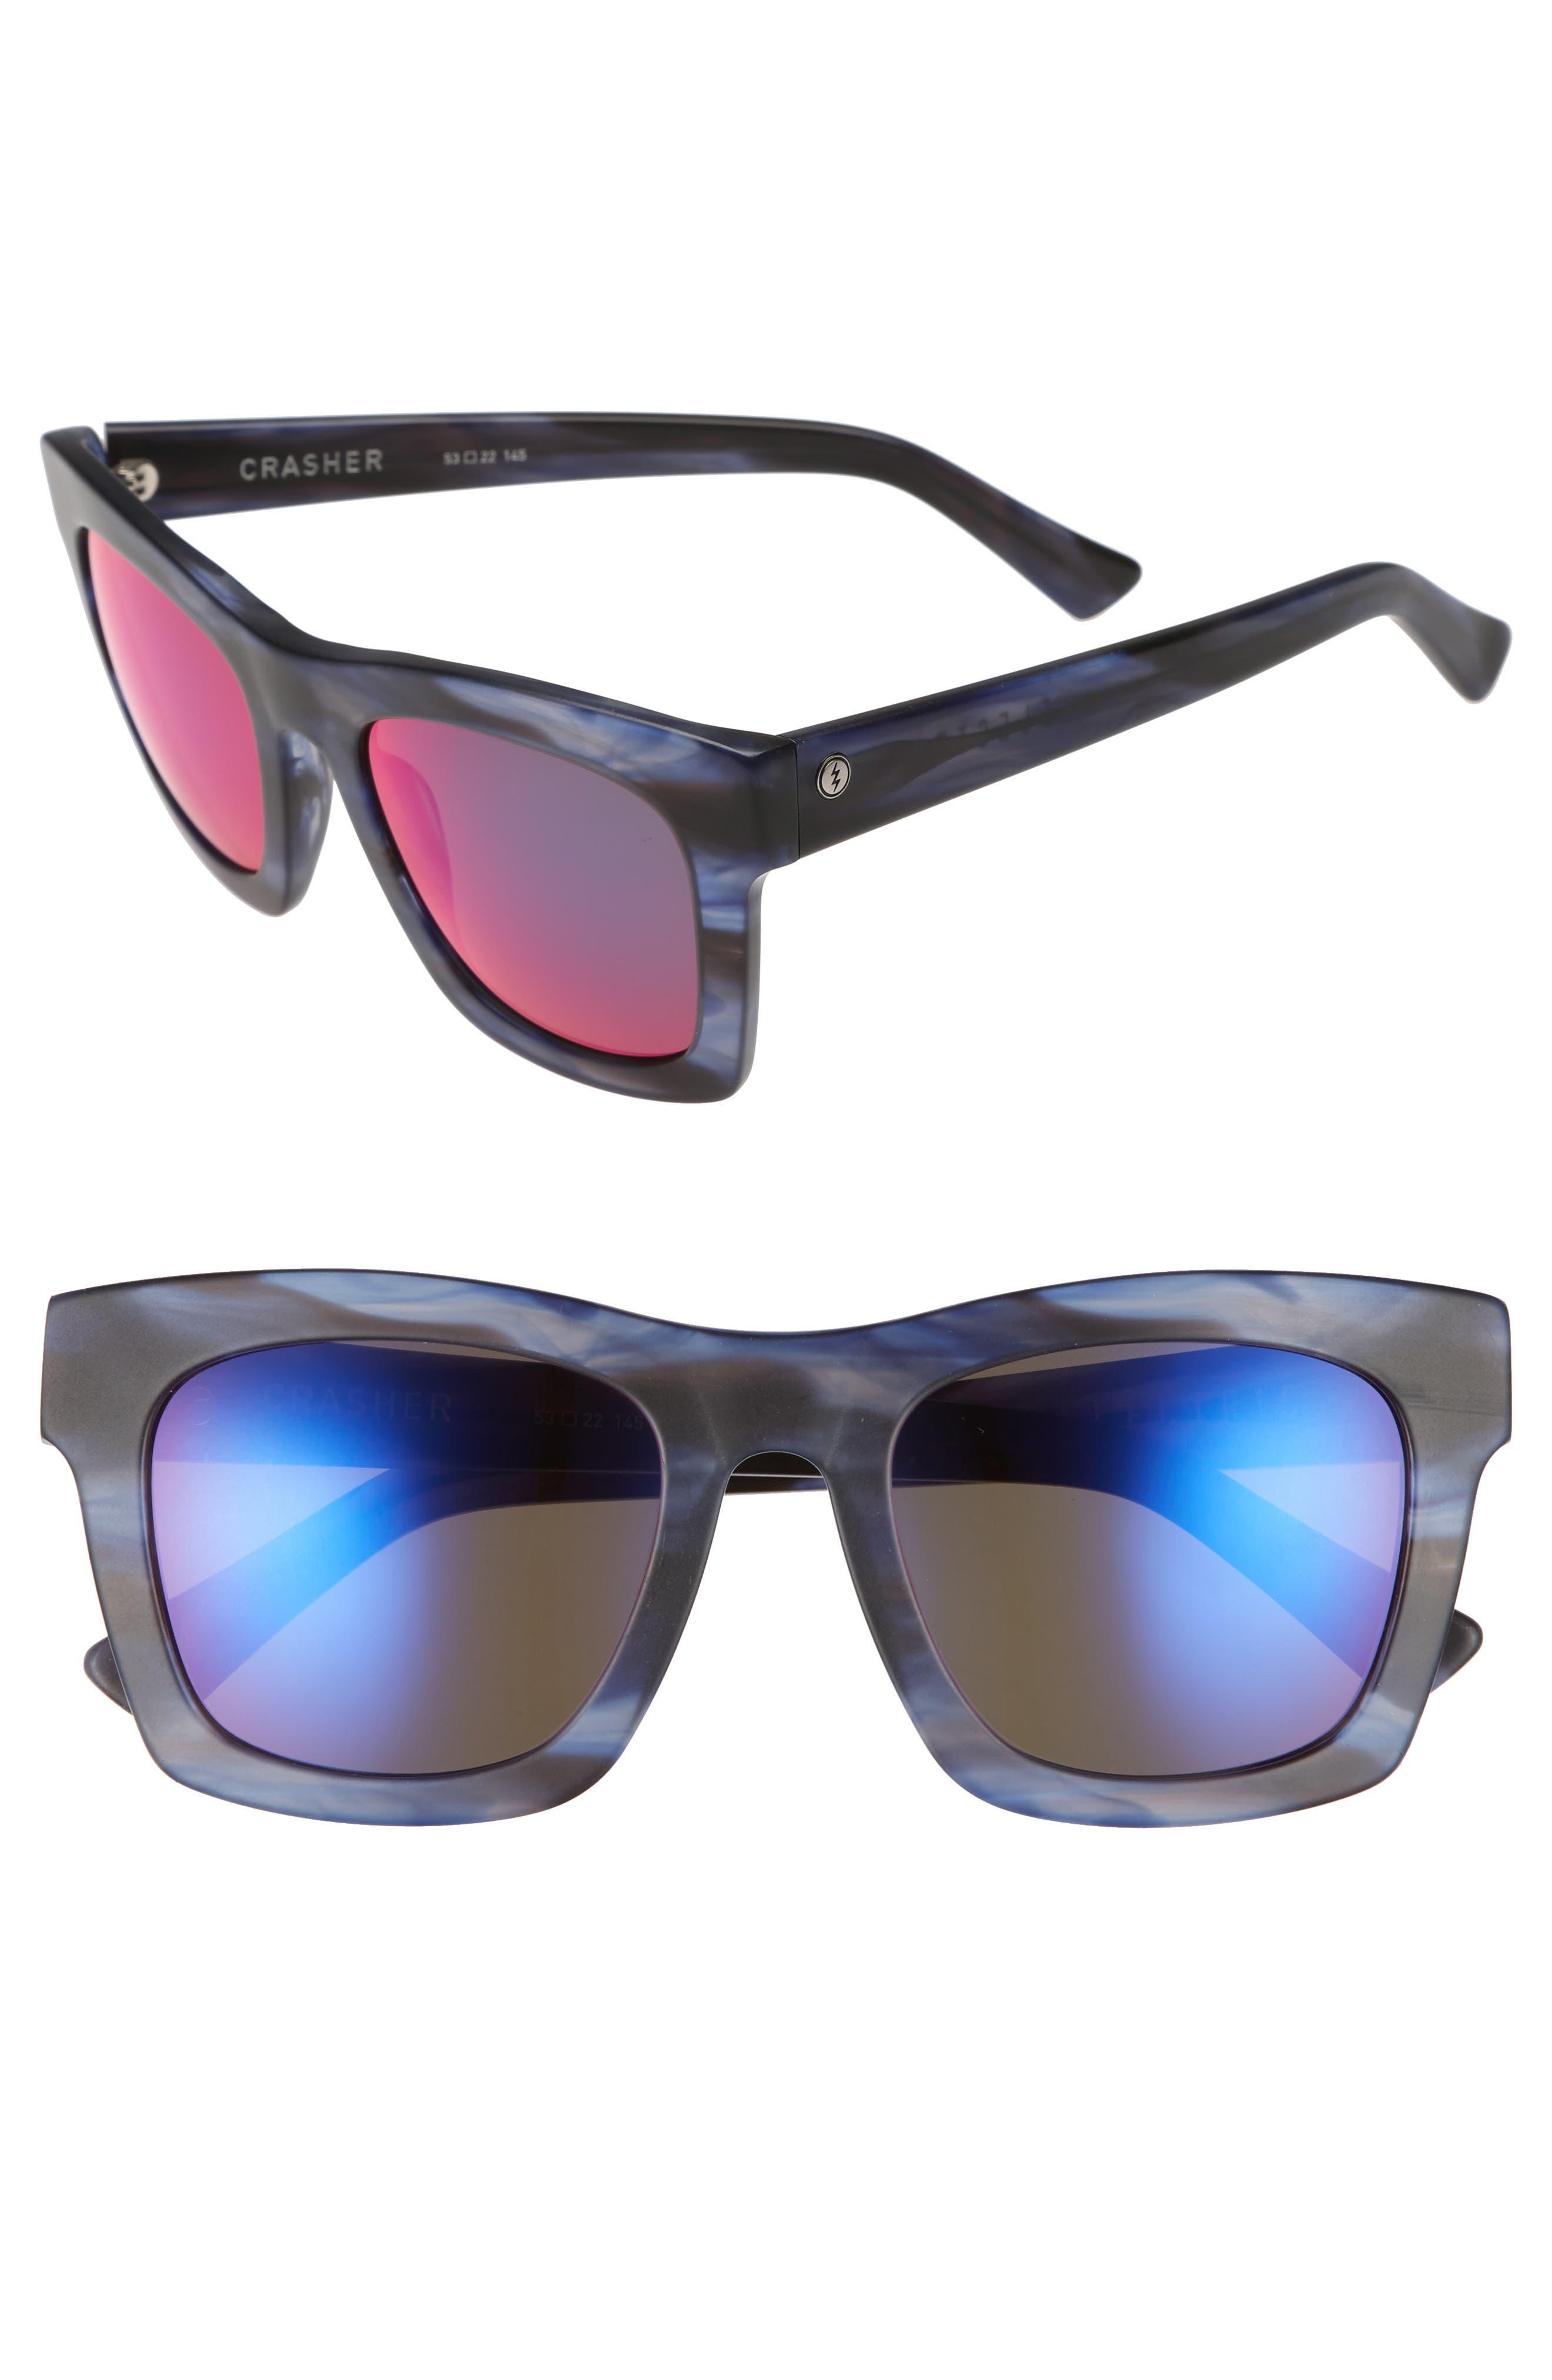 ELECTRIC Crasher 53mm Mirrored Sunglasses